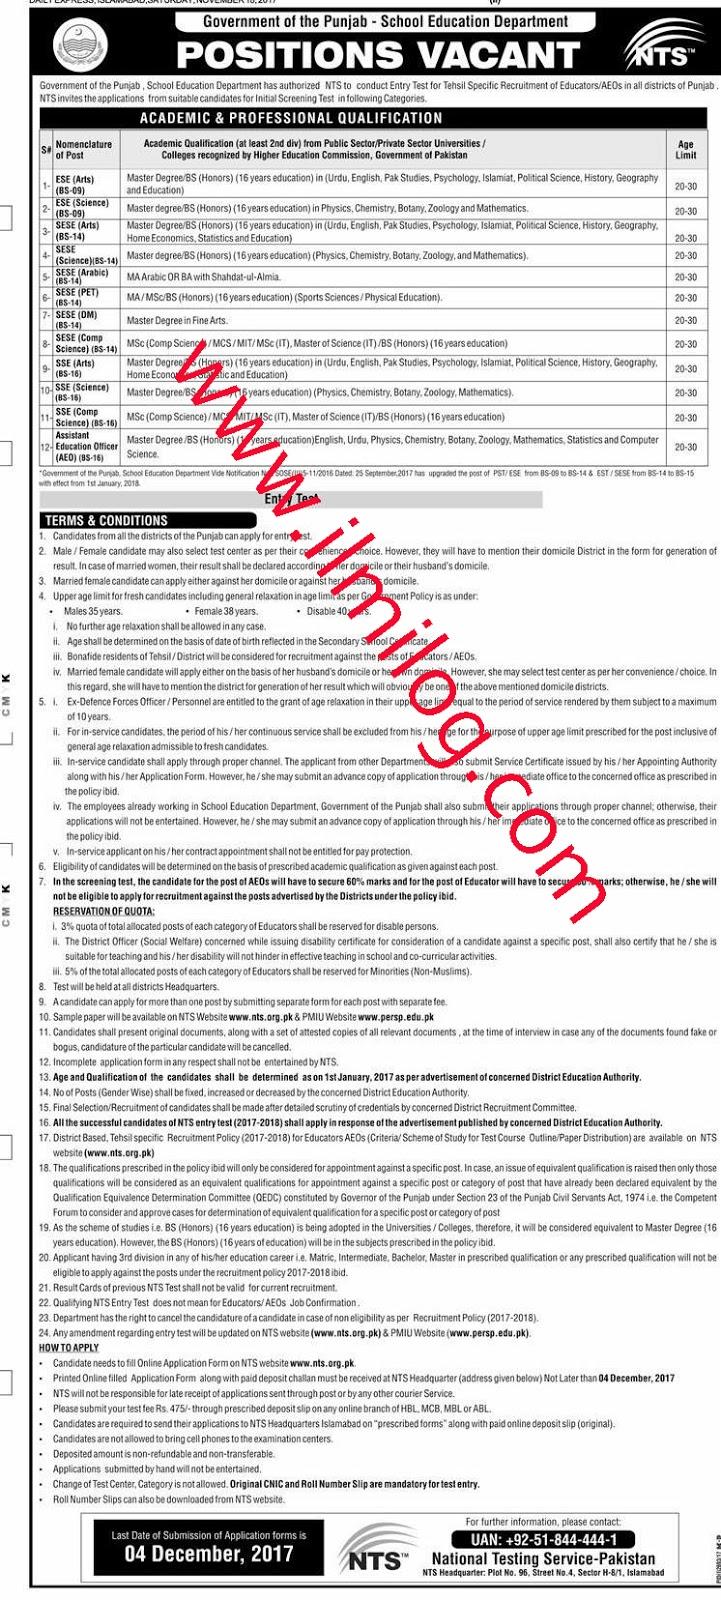 Jobs in NTS 2019 Latest | Jobs in Pakistan